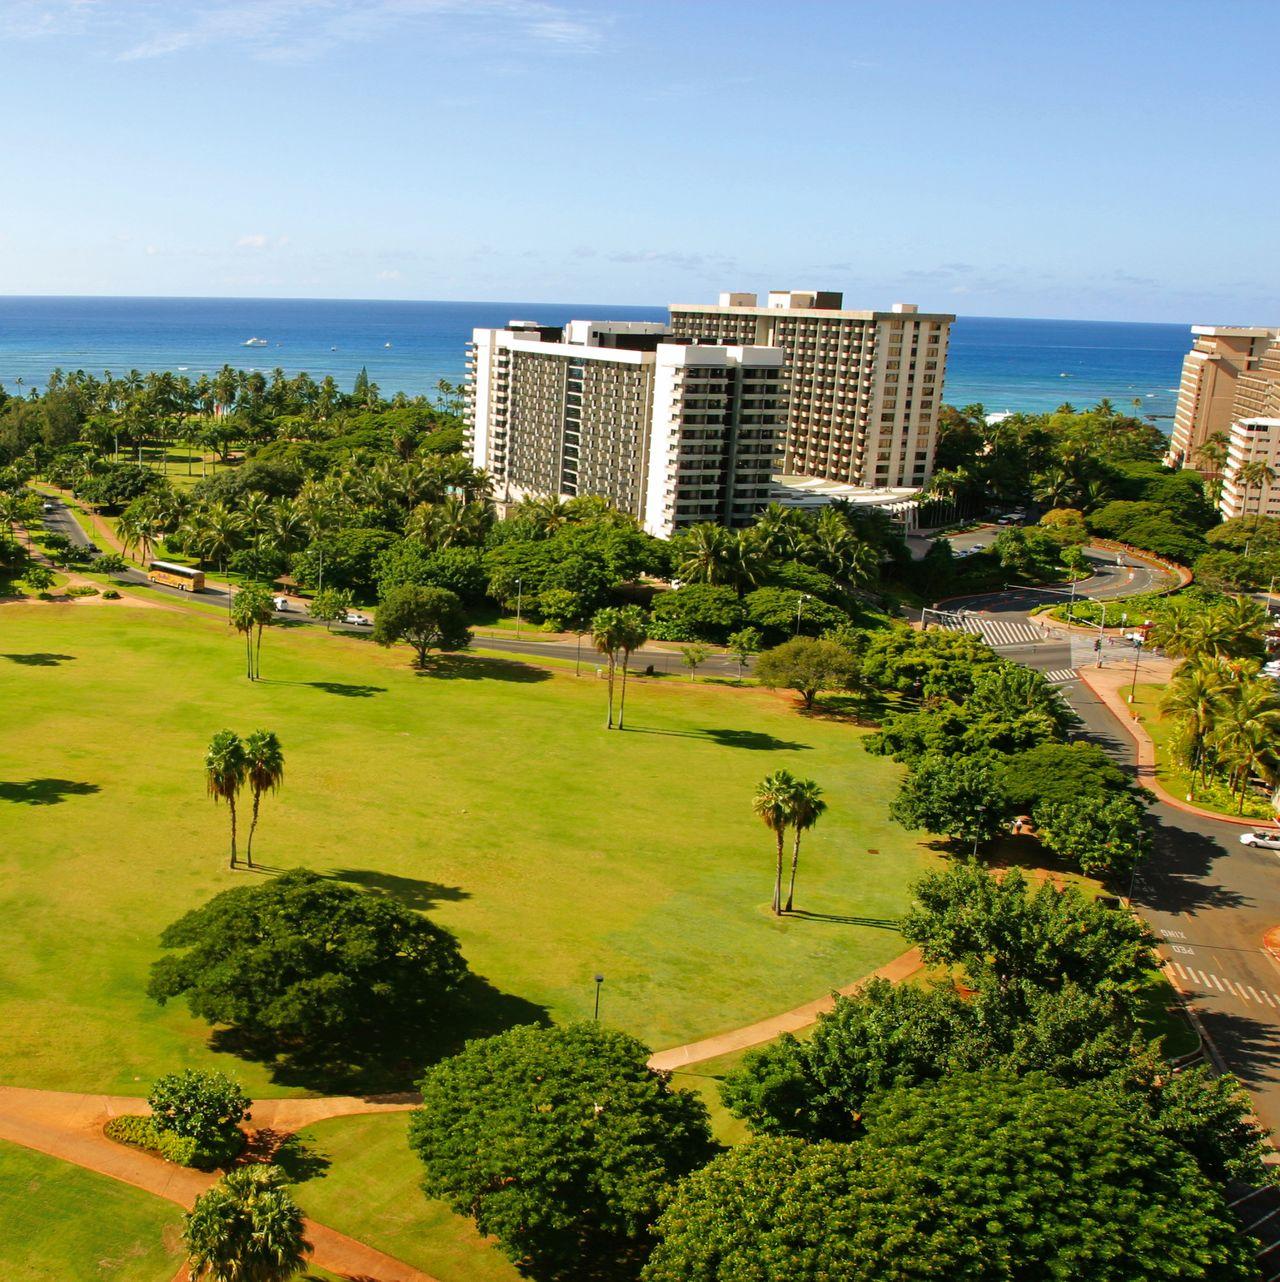 hotel hawaii luana waikiki hotel and suites canusa. Black Bedroom Furniture Sets. Home Design Ideas